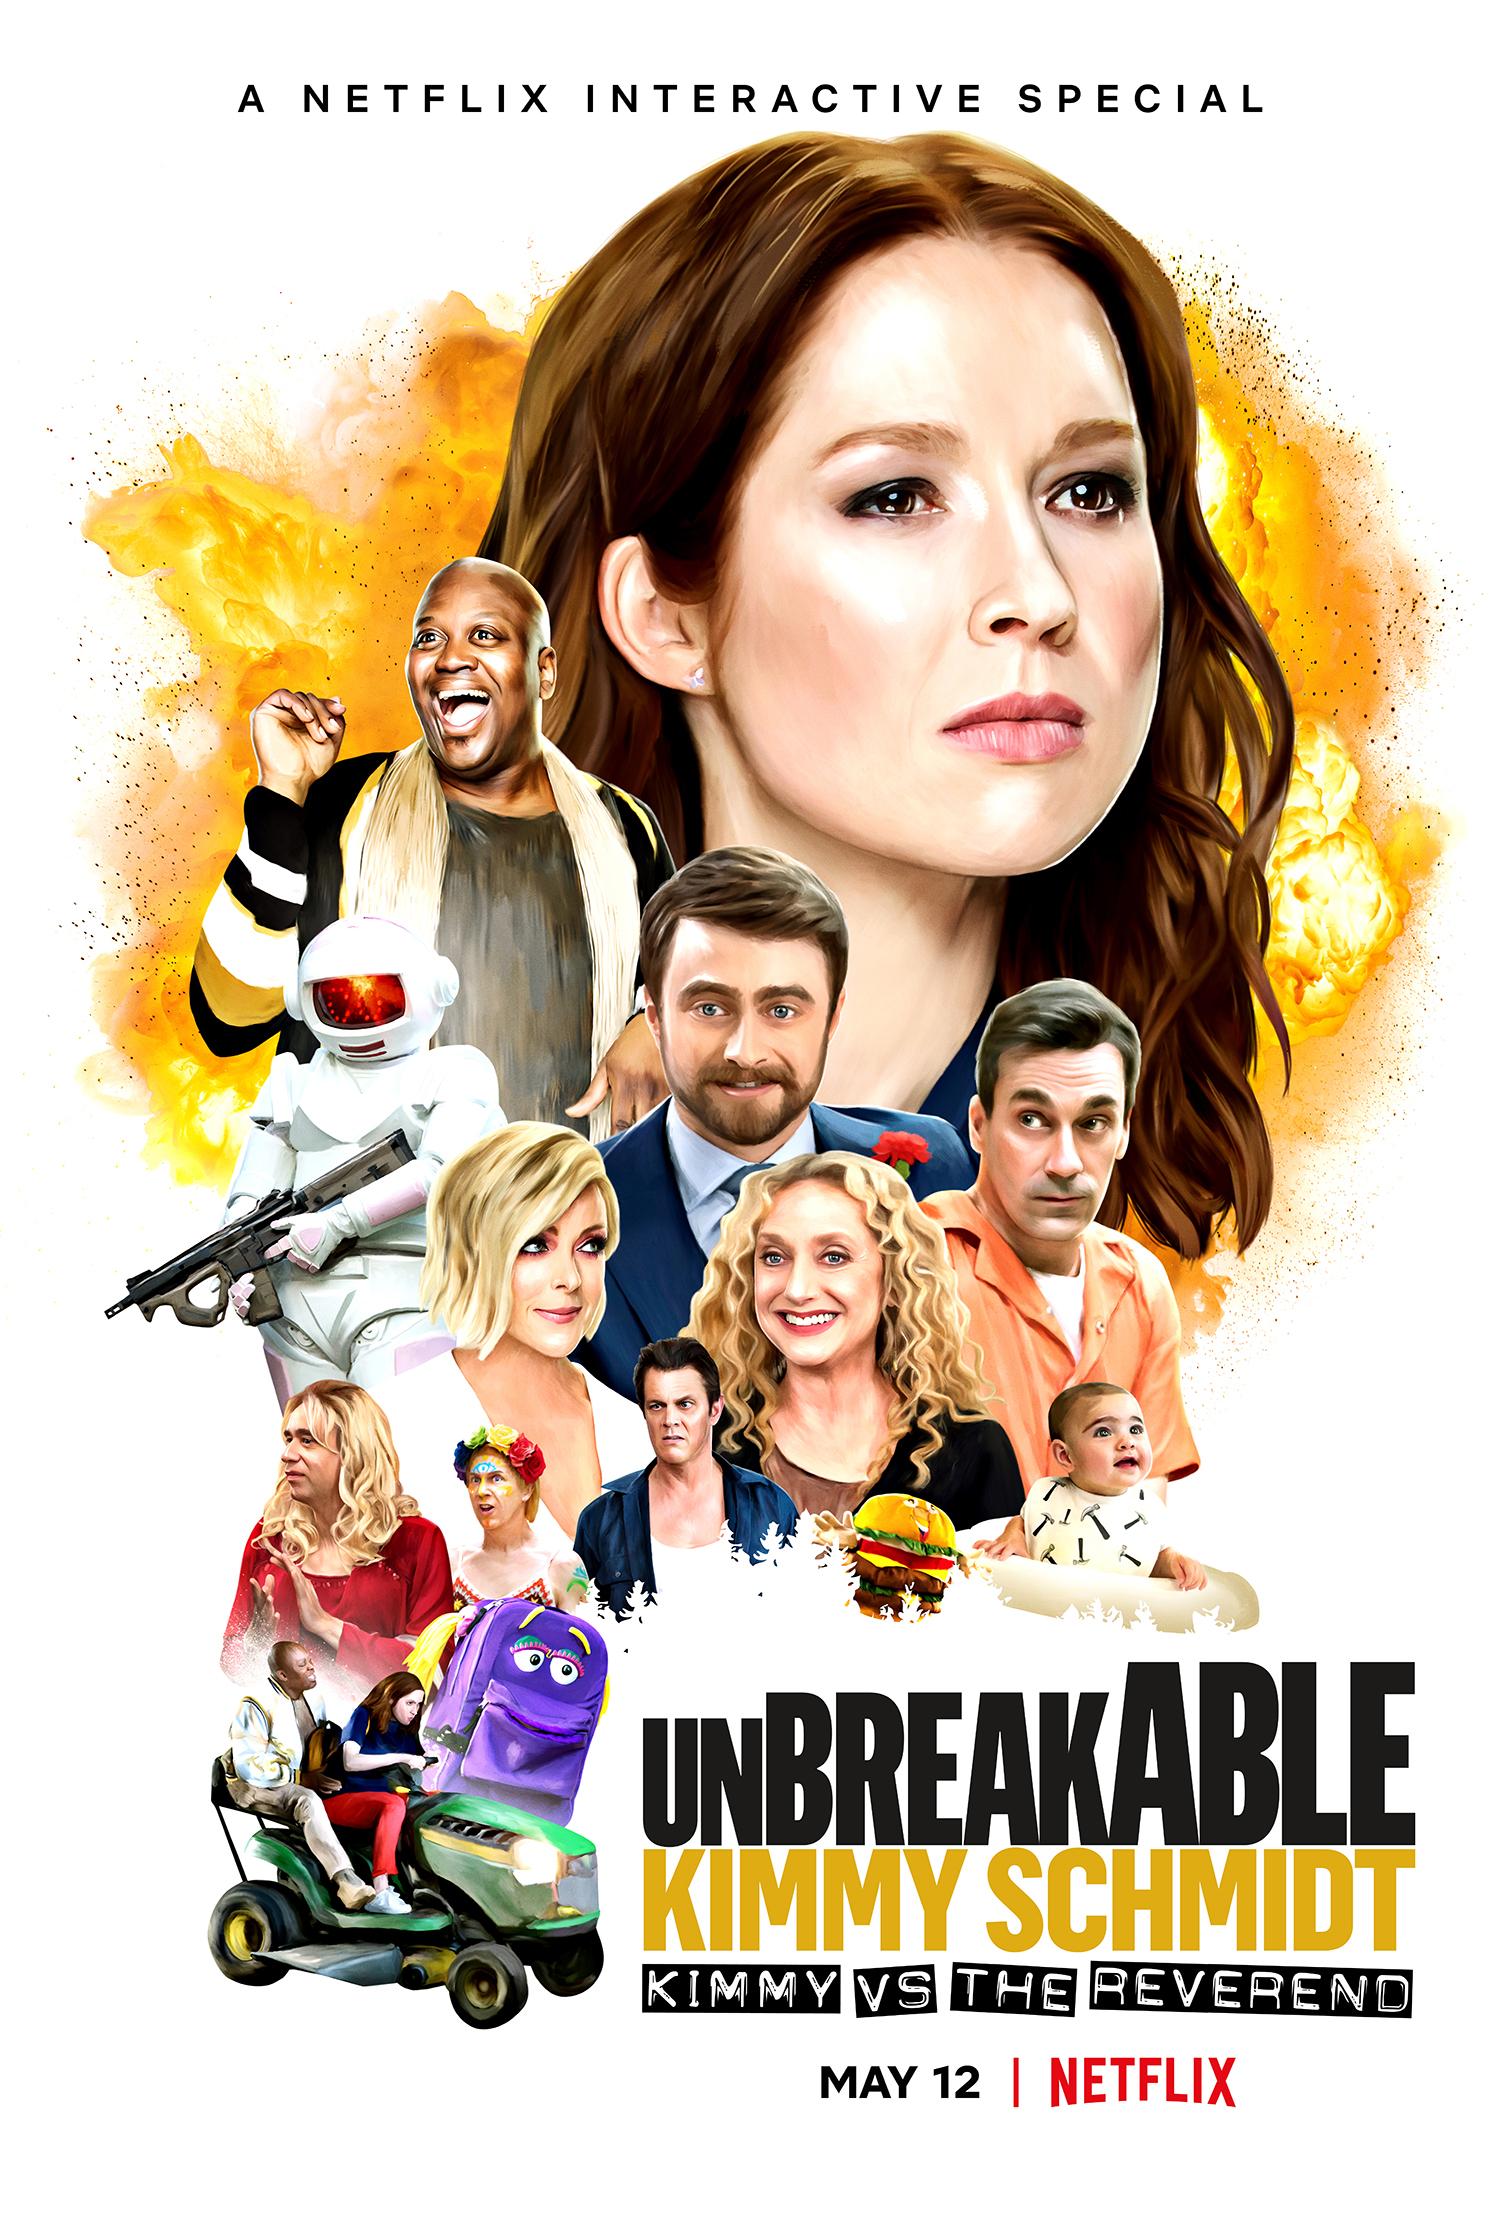 New Show: Netflix's Unbreakable Kimmy Schmidt Starring Ellie Kemper